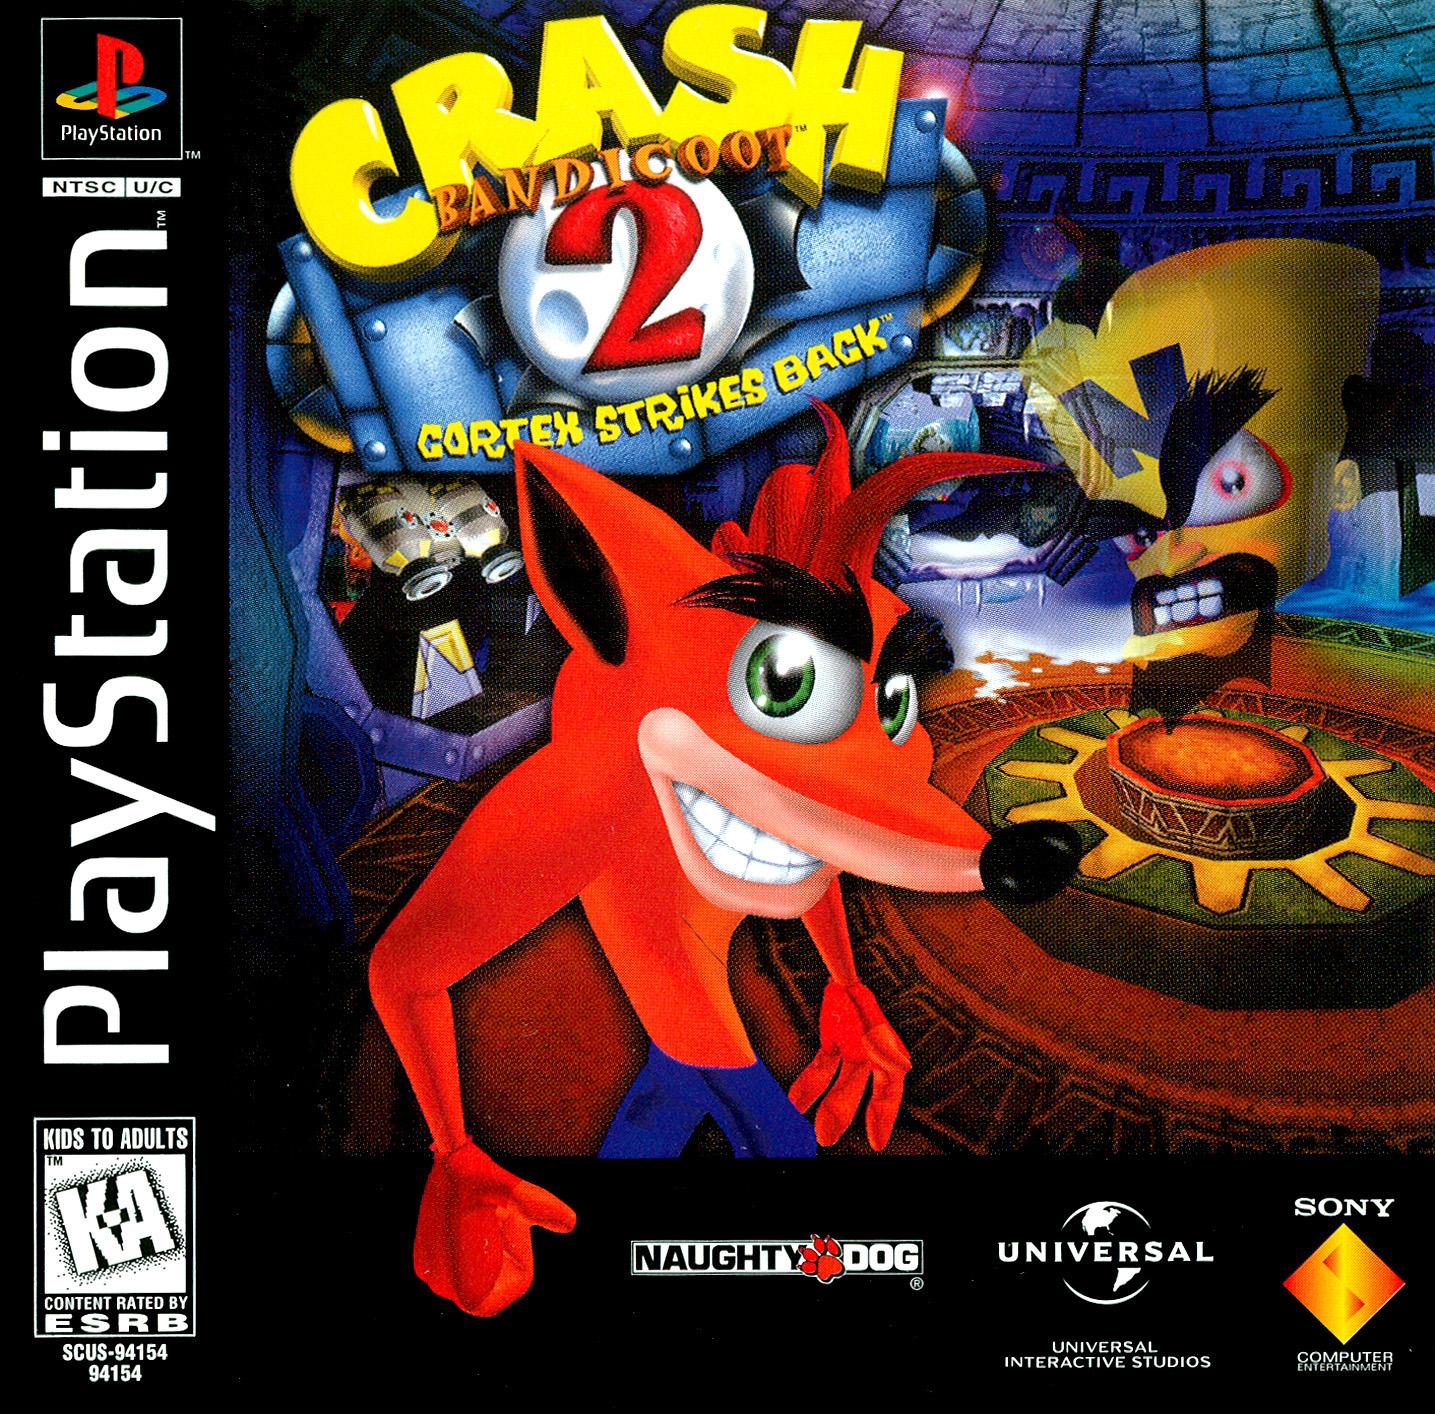 Crash bandicoot games 2 cheap hotel near foxwoods casino